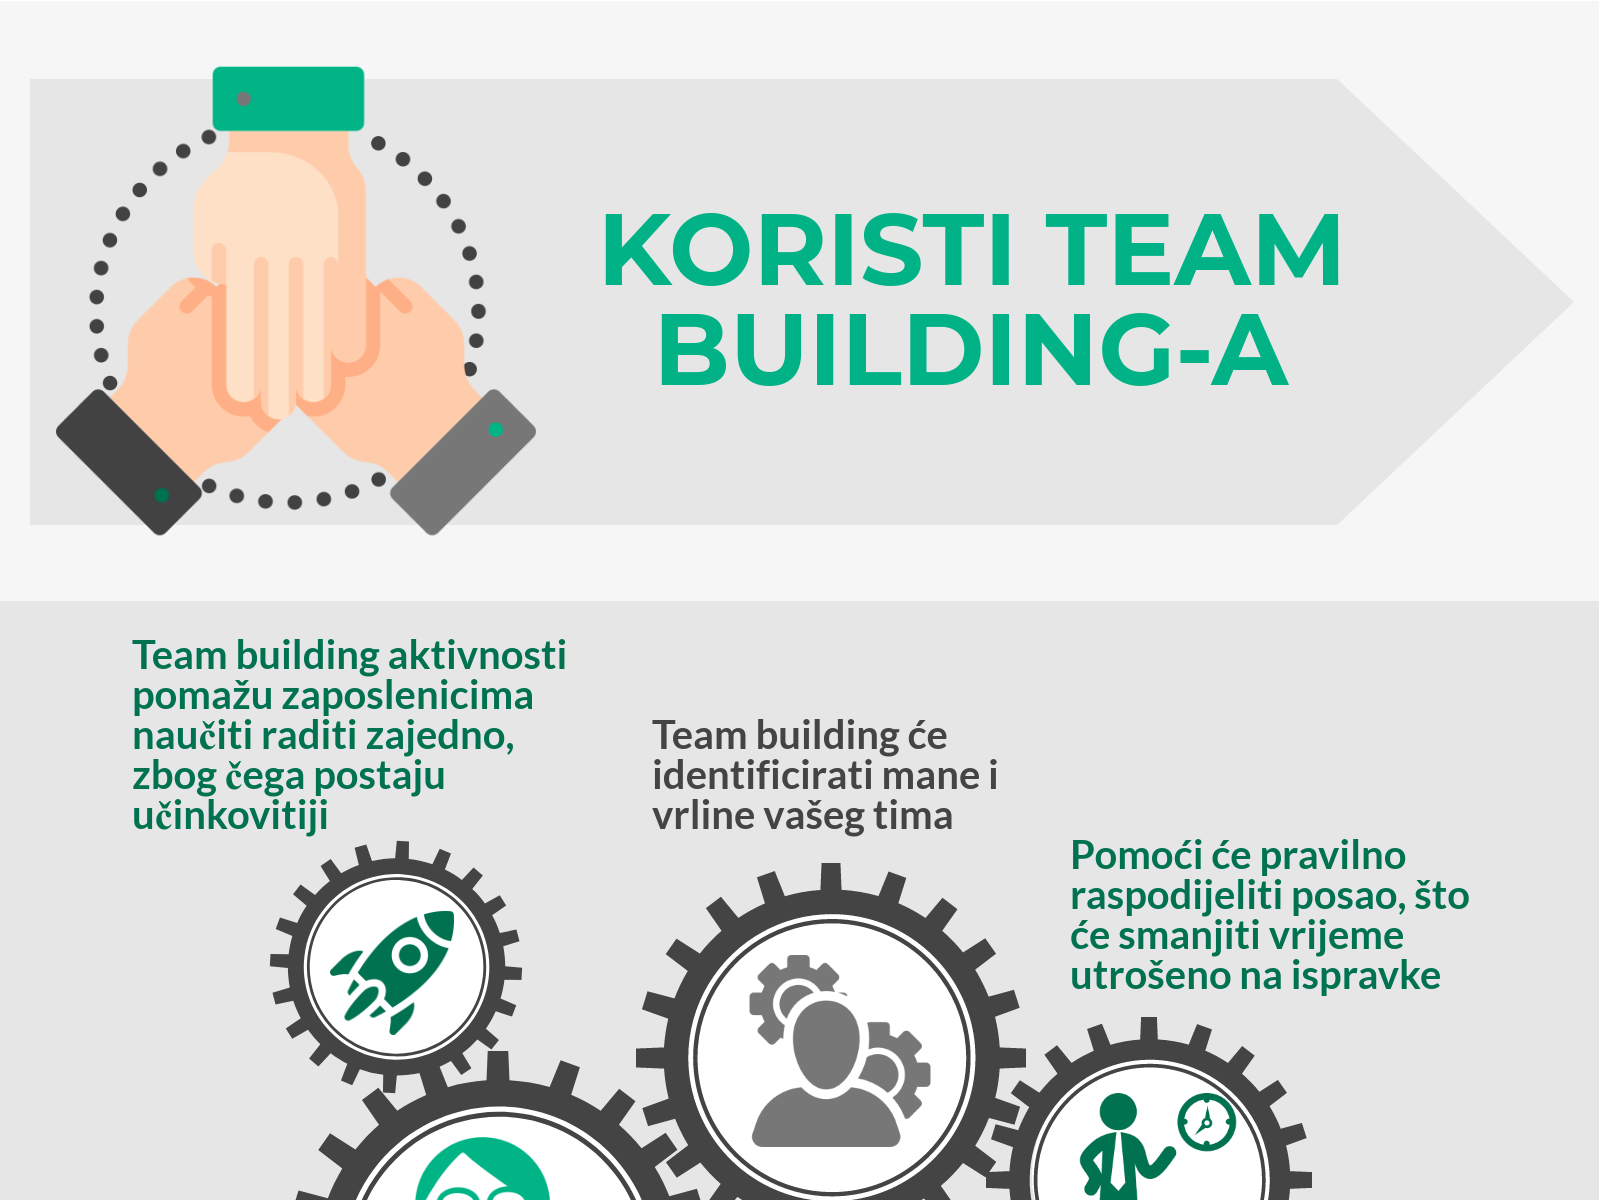 Gooma_koristi team building-a